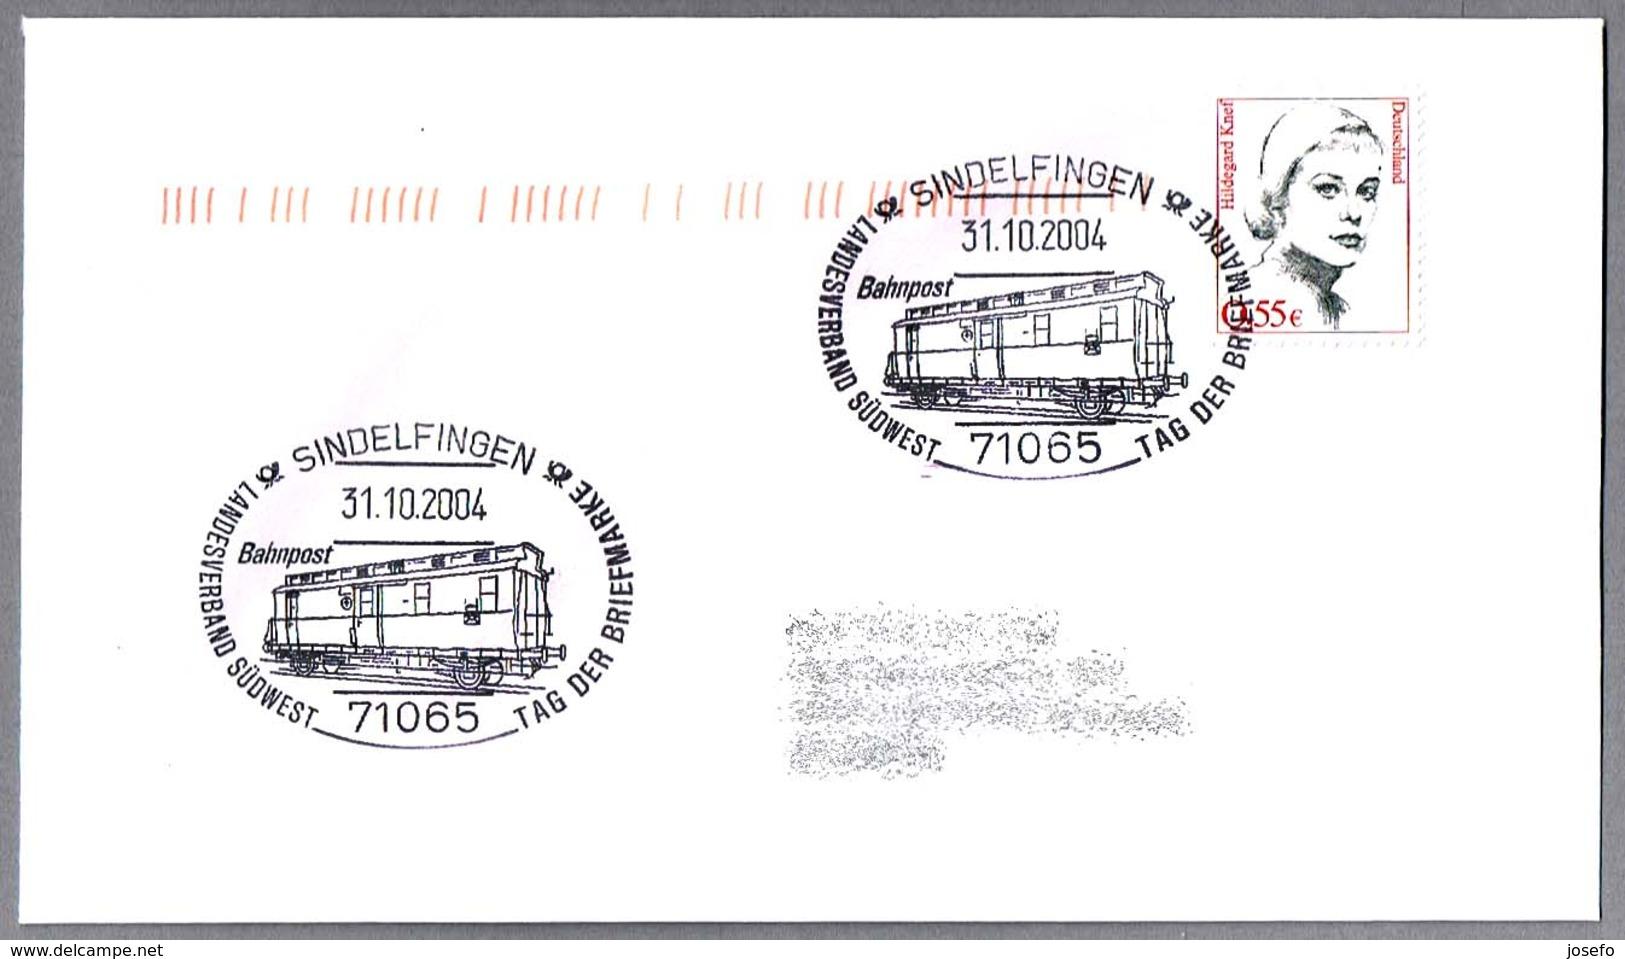 VAGON POSTAL - POSTAL WAGON - BAHNPOST. Sindelfingen 2004 - Correo Postal